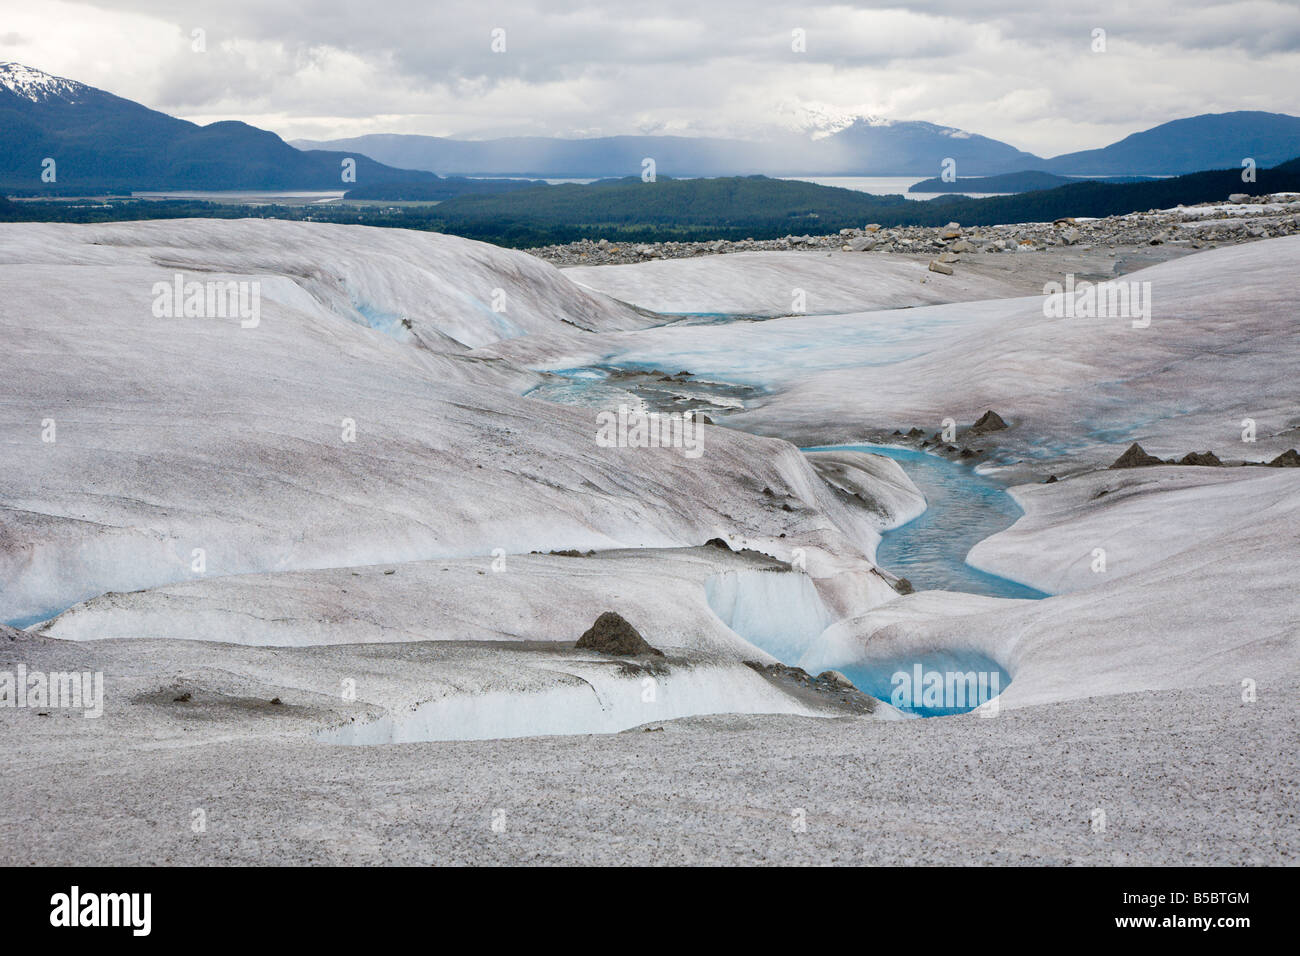 Meltng ice carves streams into top of Mendenhall Glacier near Juneau, Alaska - Stock Image